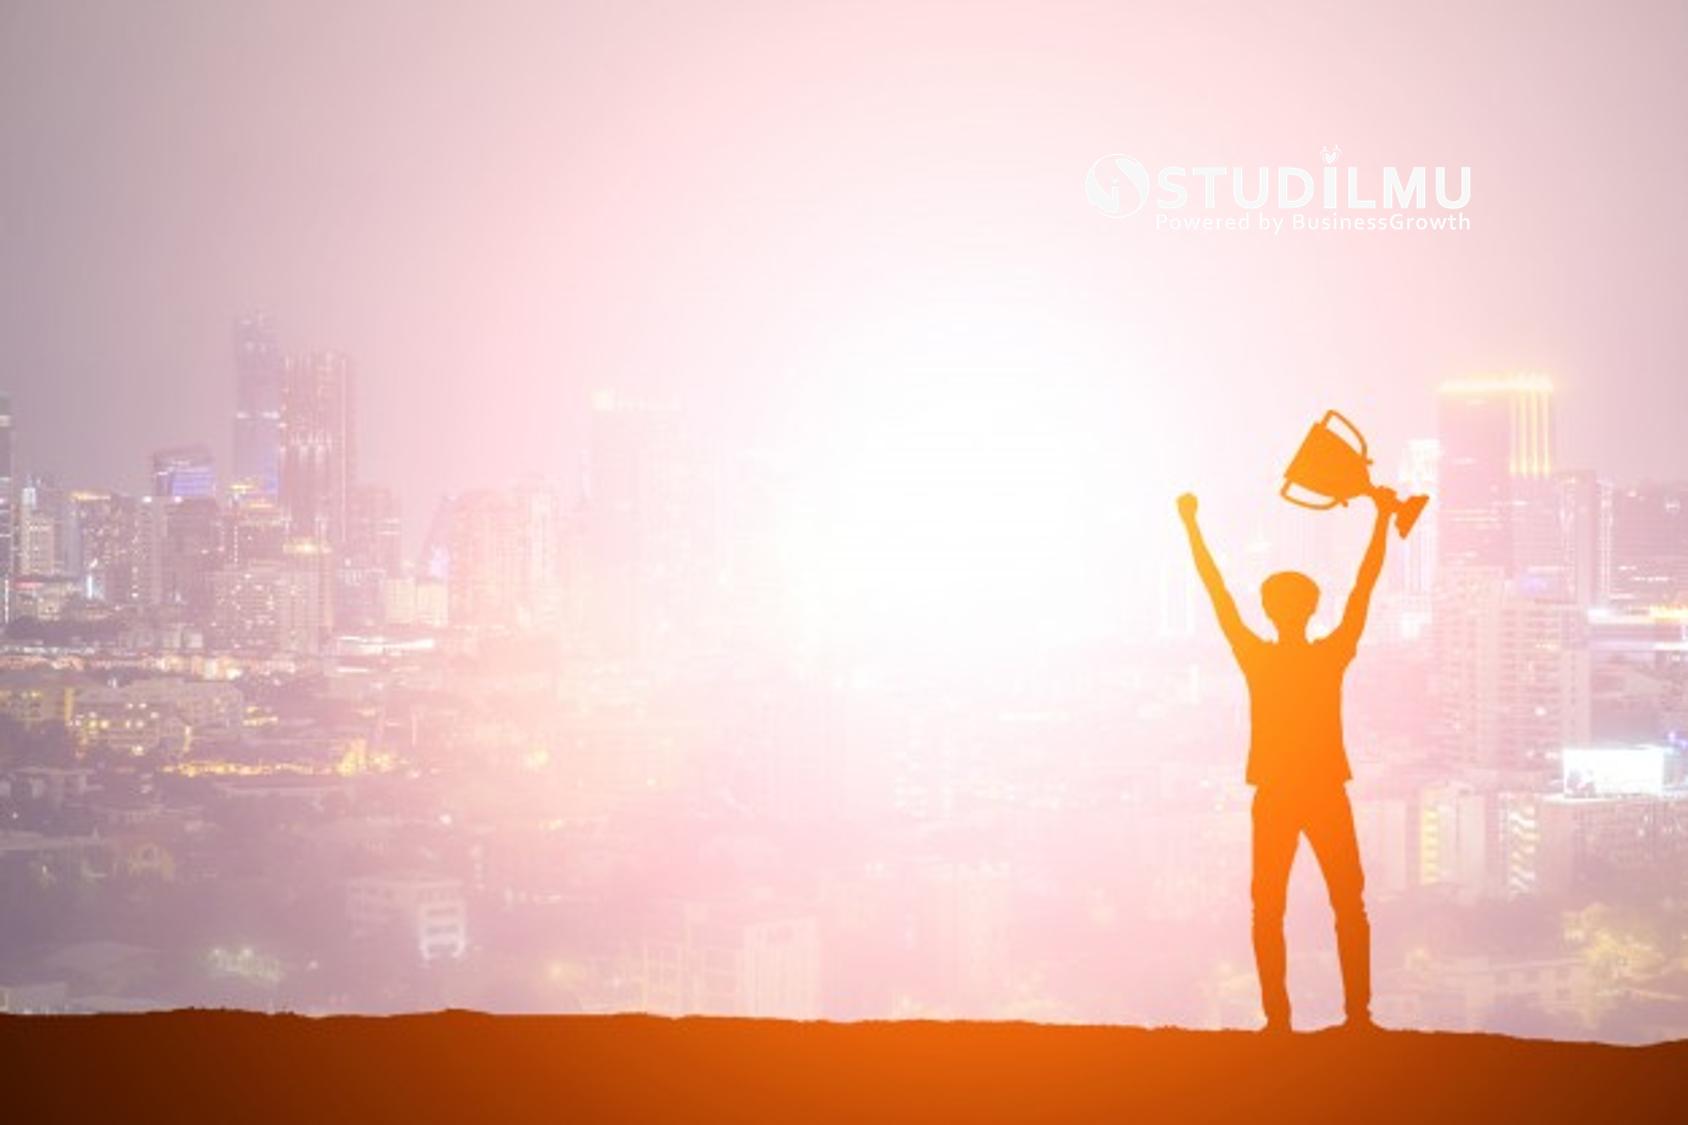 STUDILMU Career Advice - 10 Kebaikan yang Merupakan Kunci Sukses